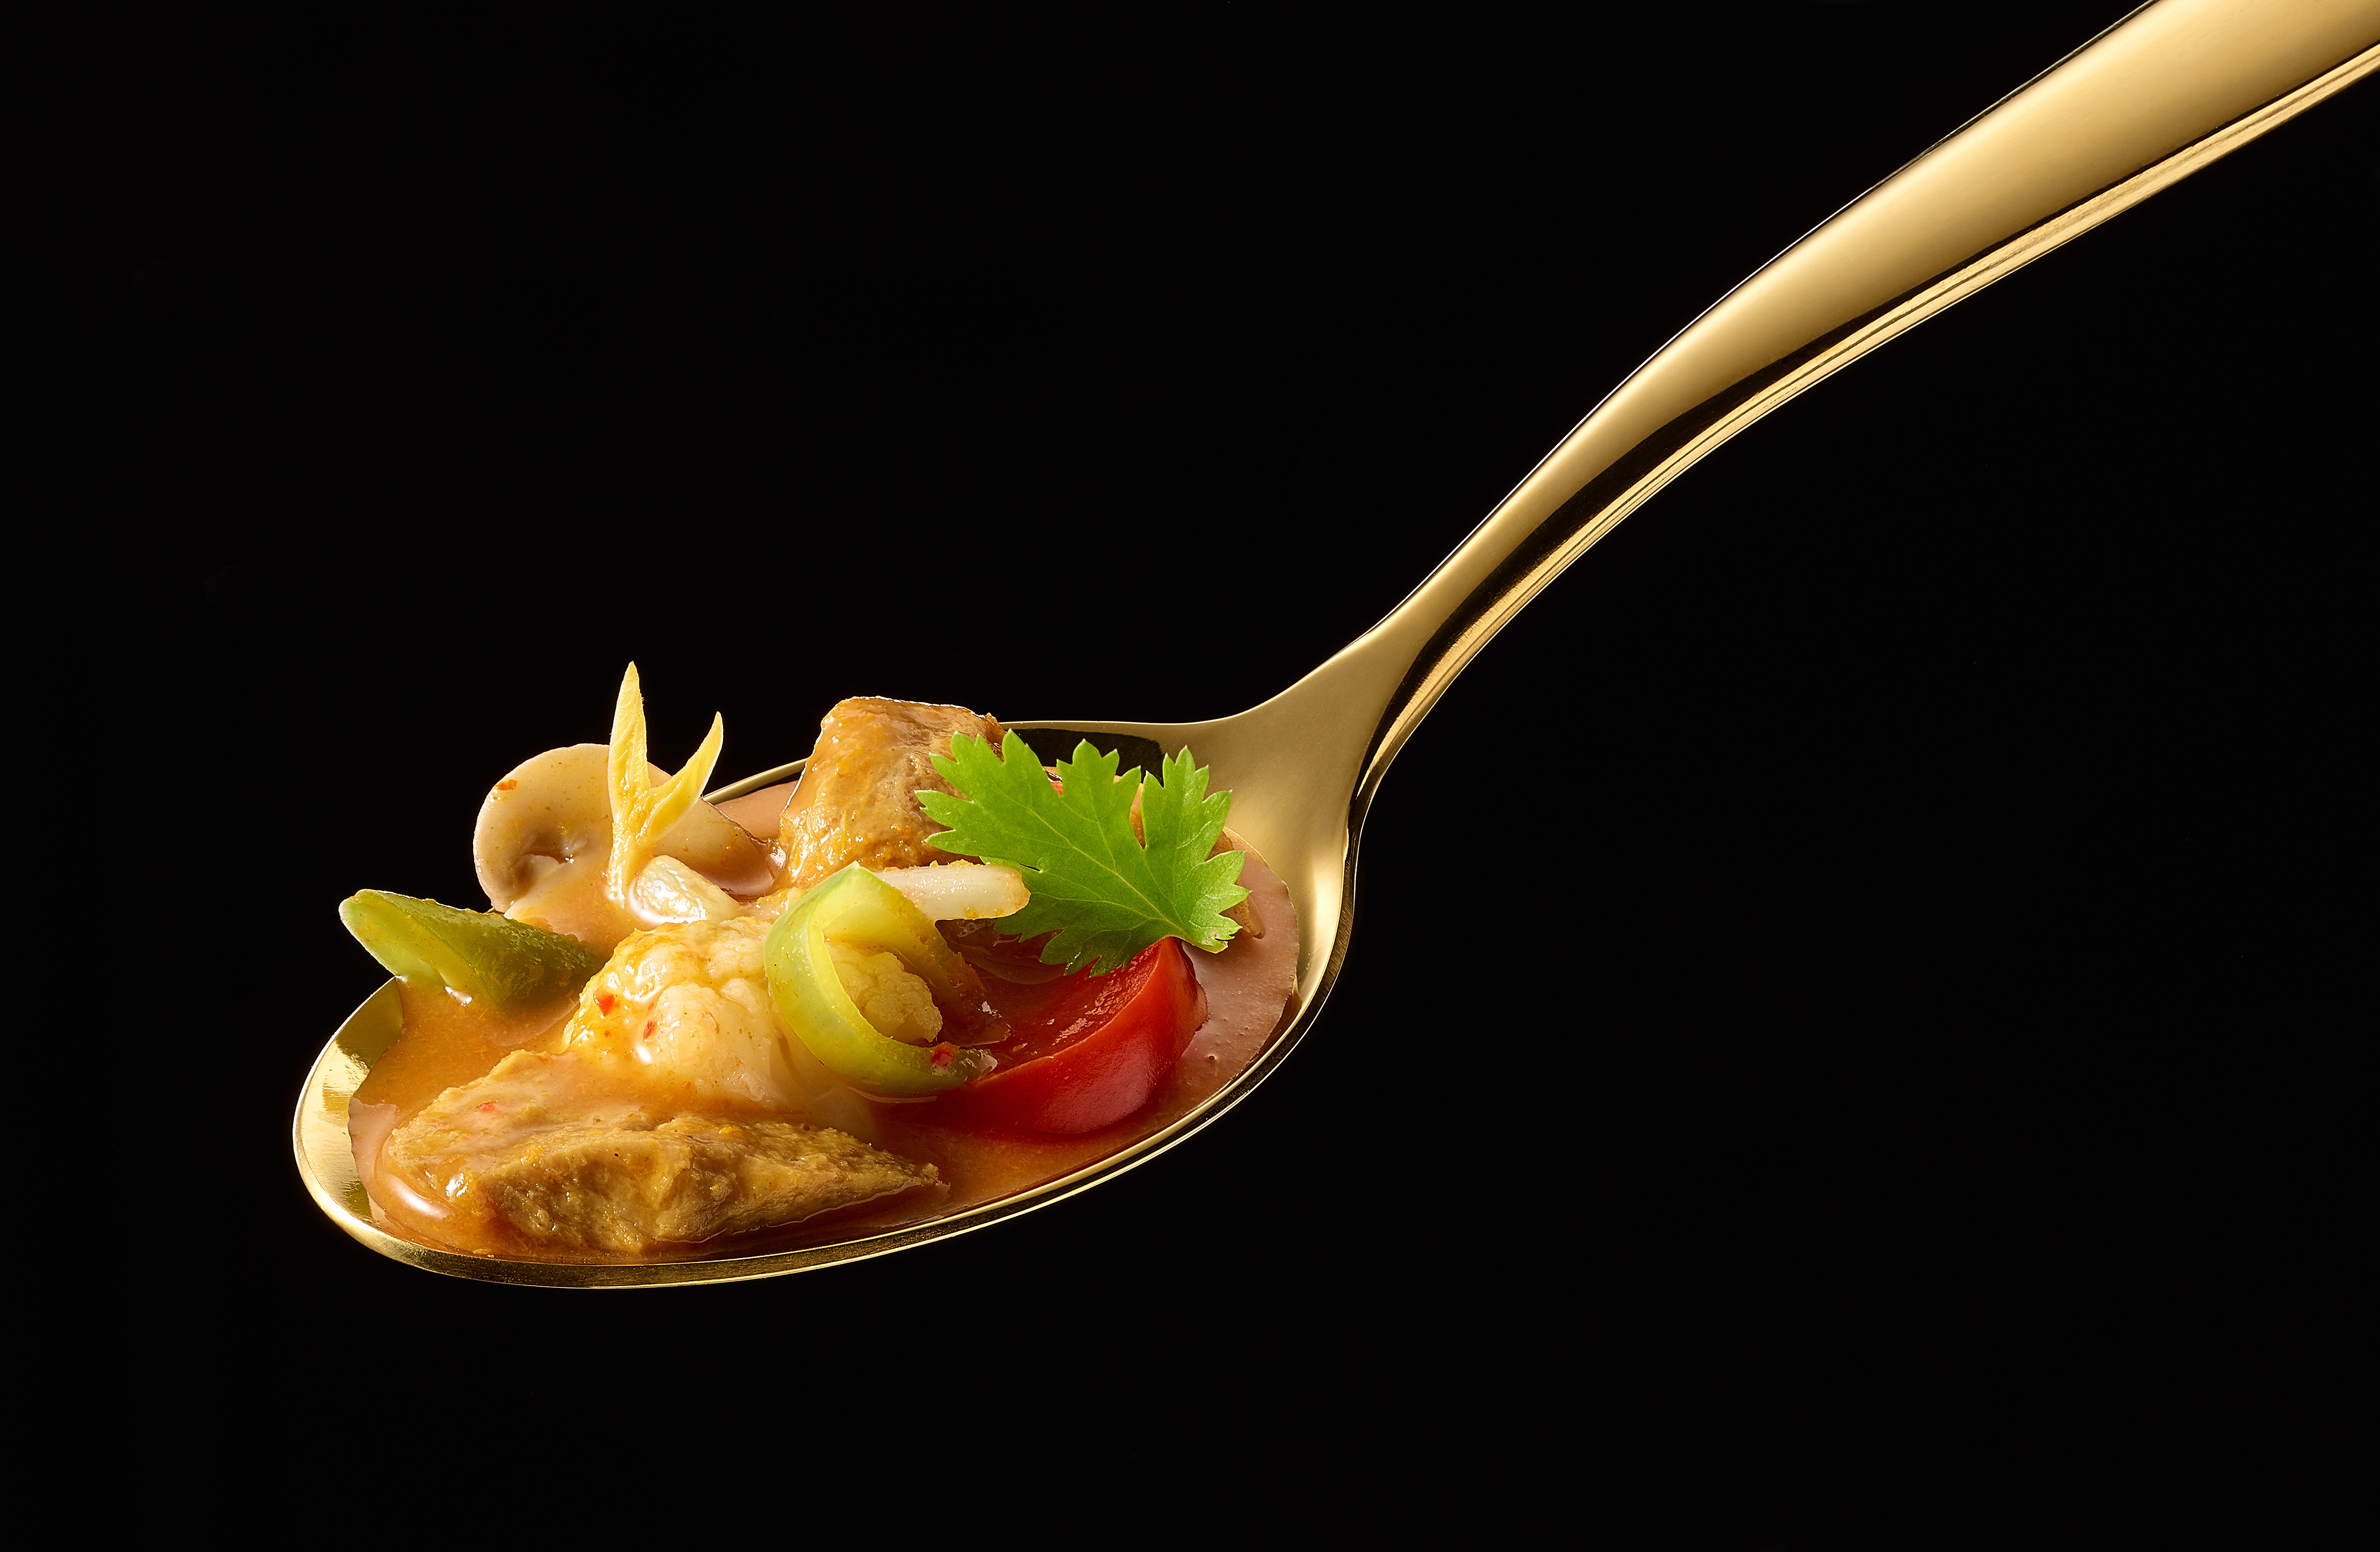 Vegan Thai Soup on a golden spoon